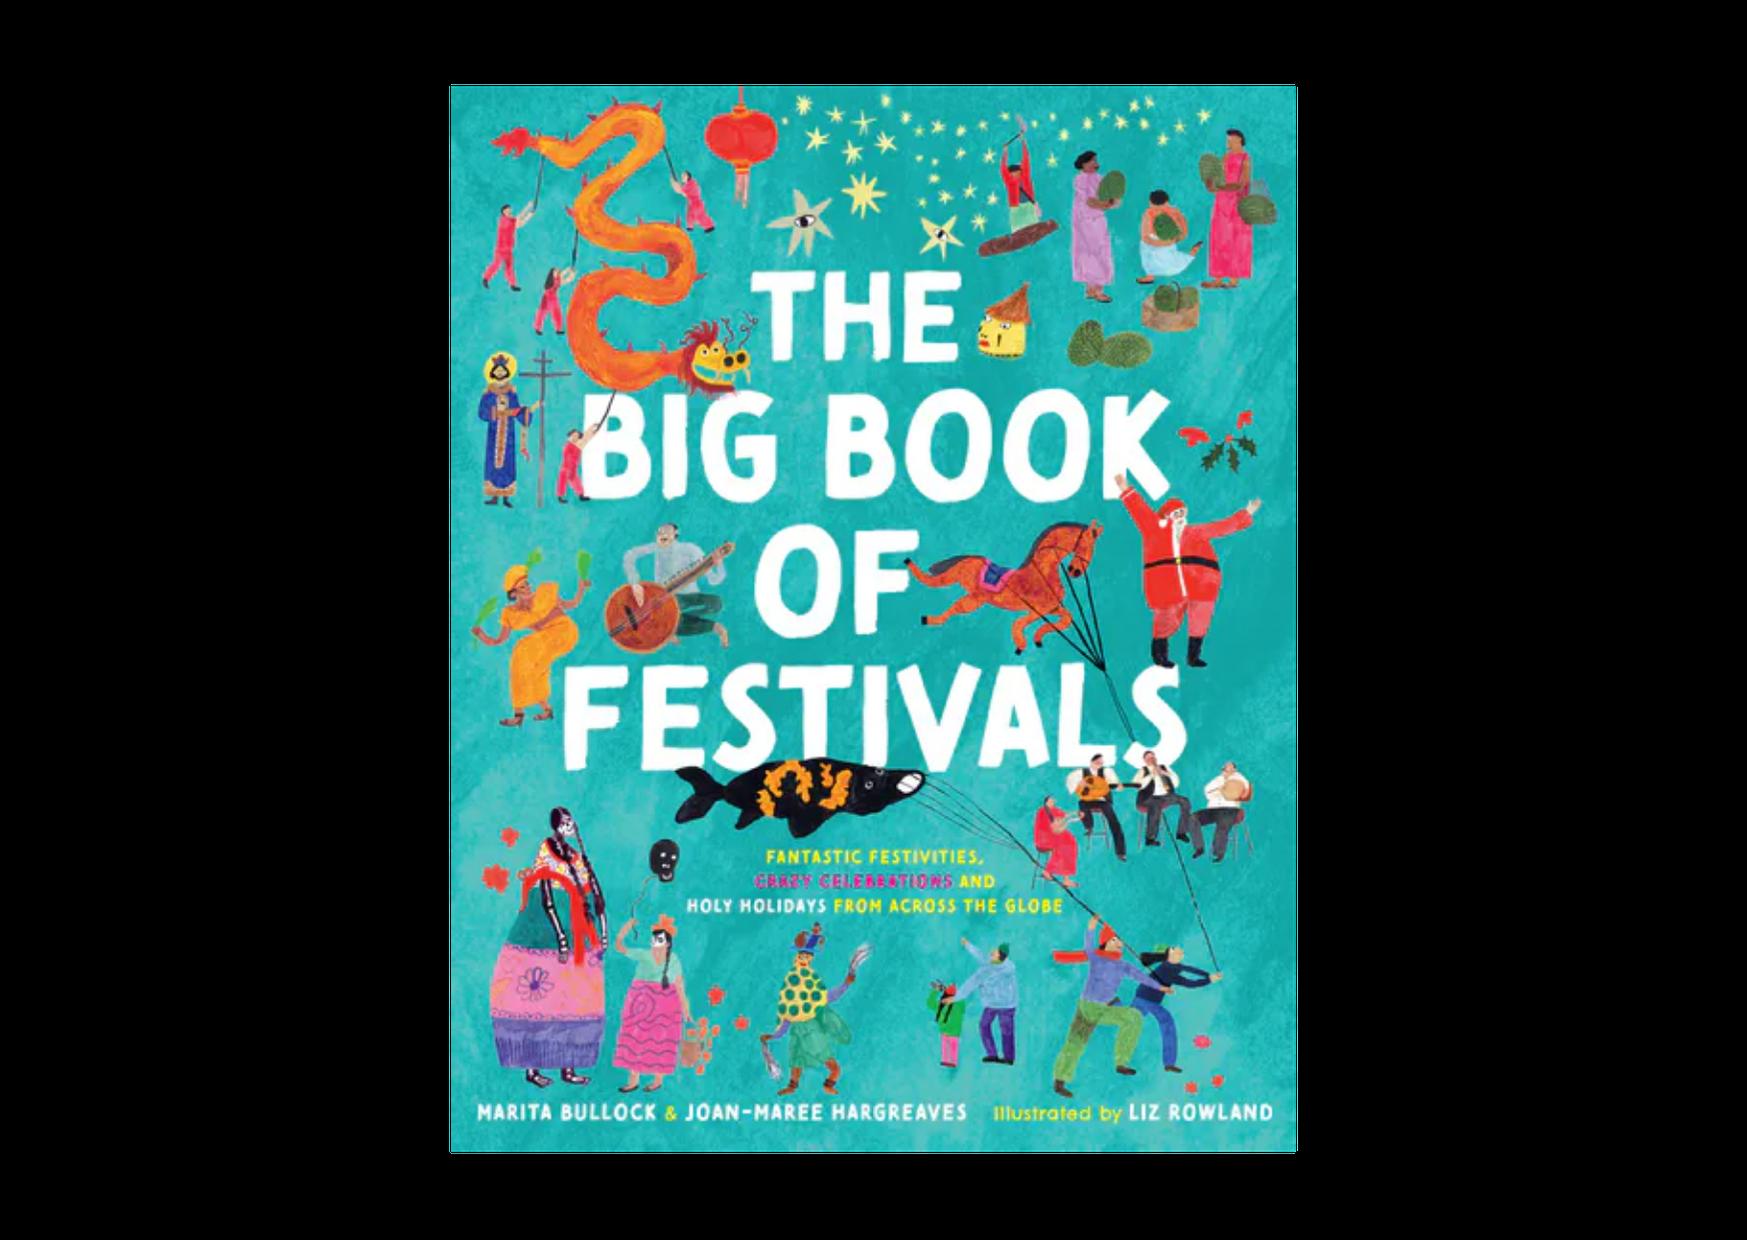 Hachette - The Big Book of Festivals